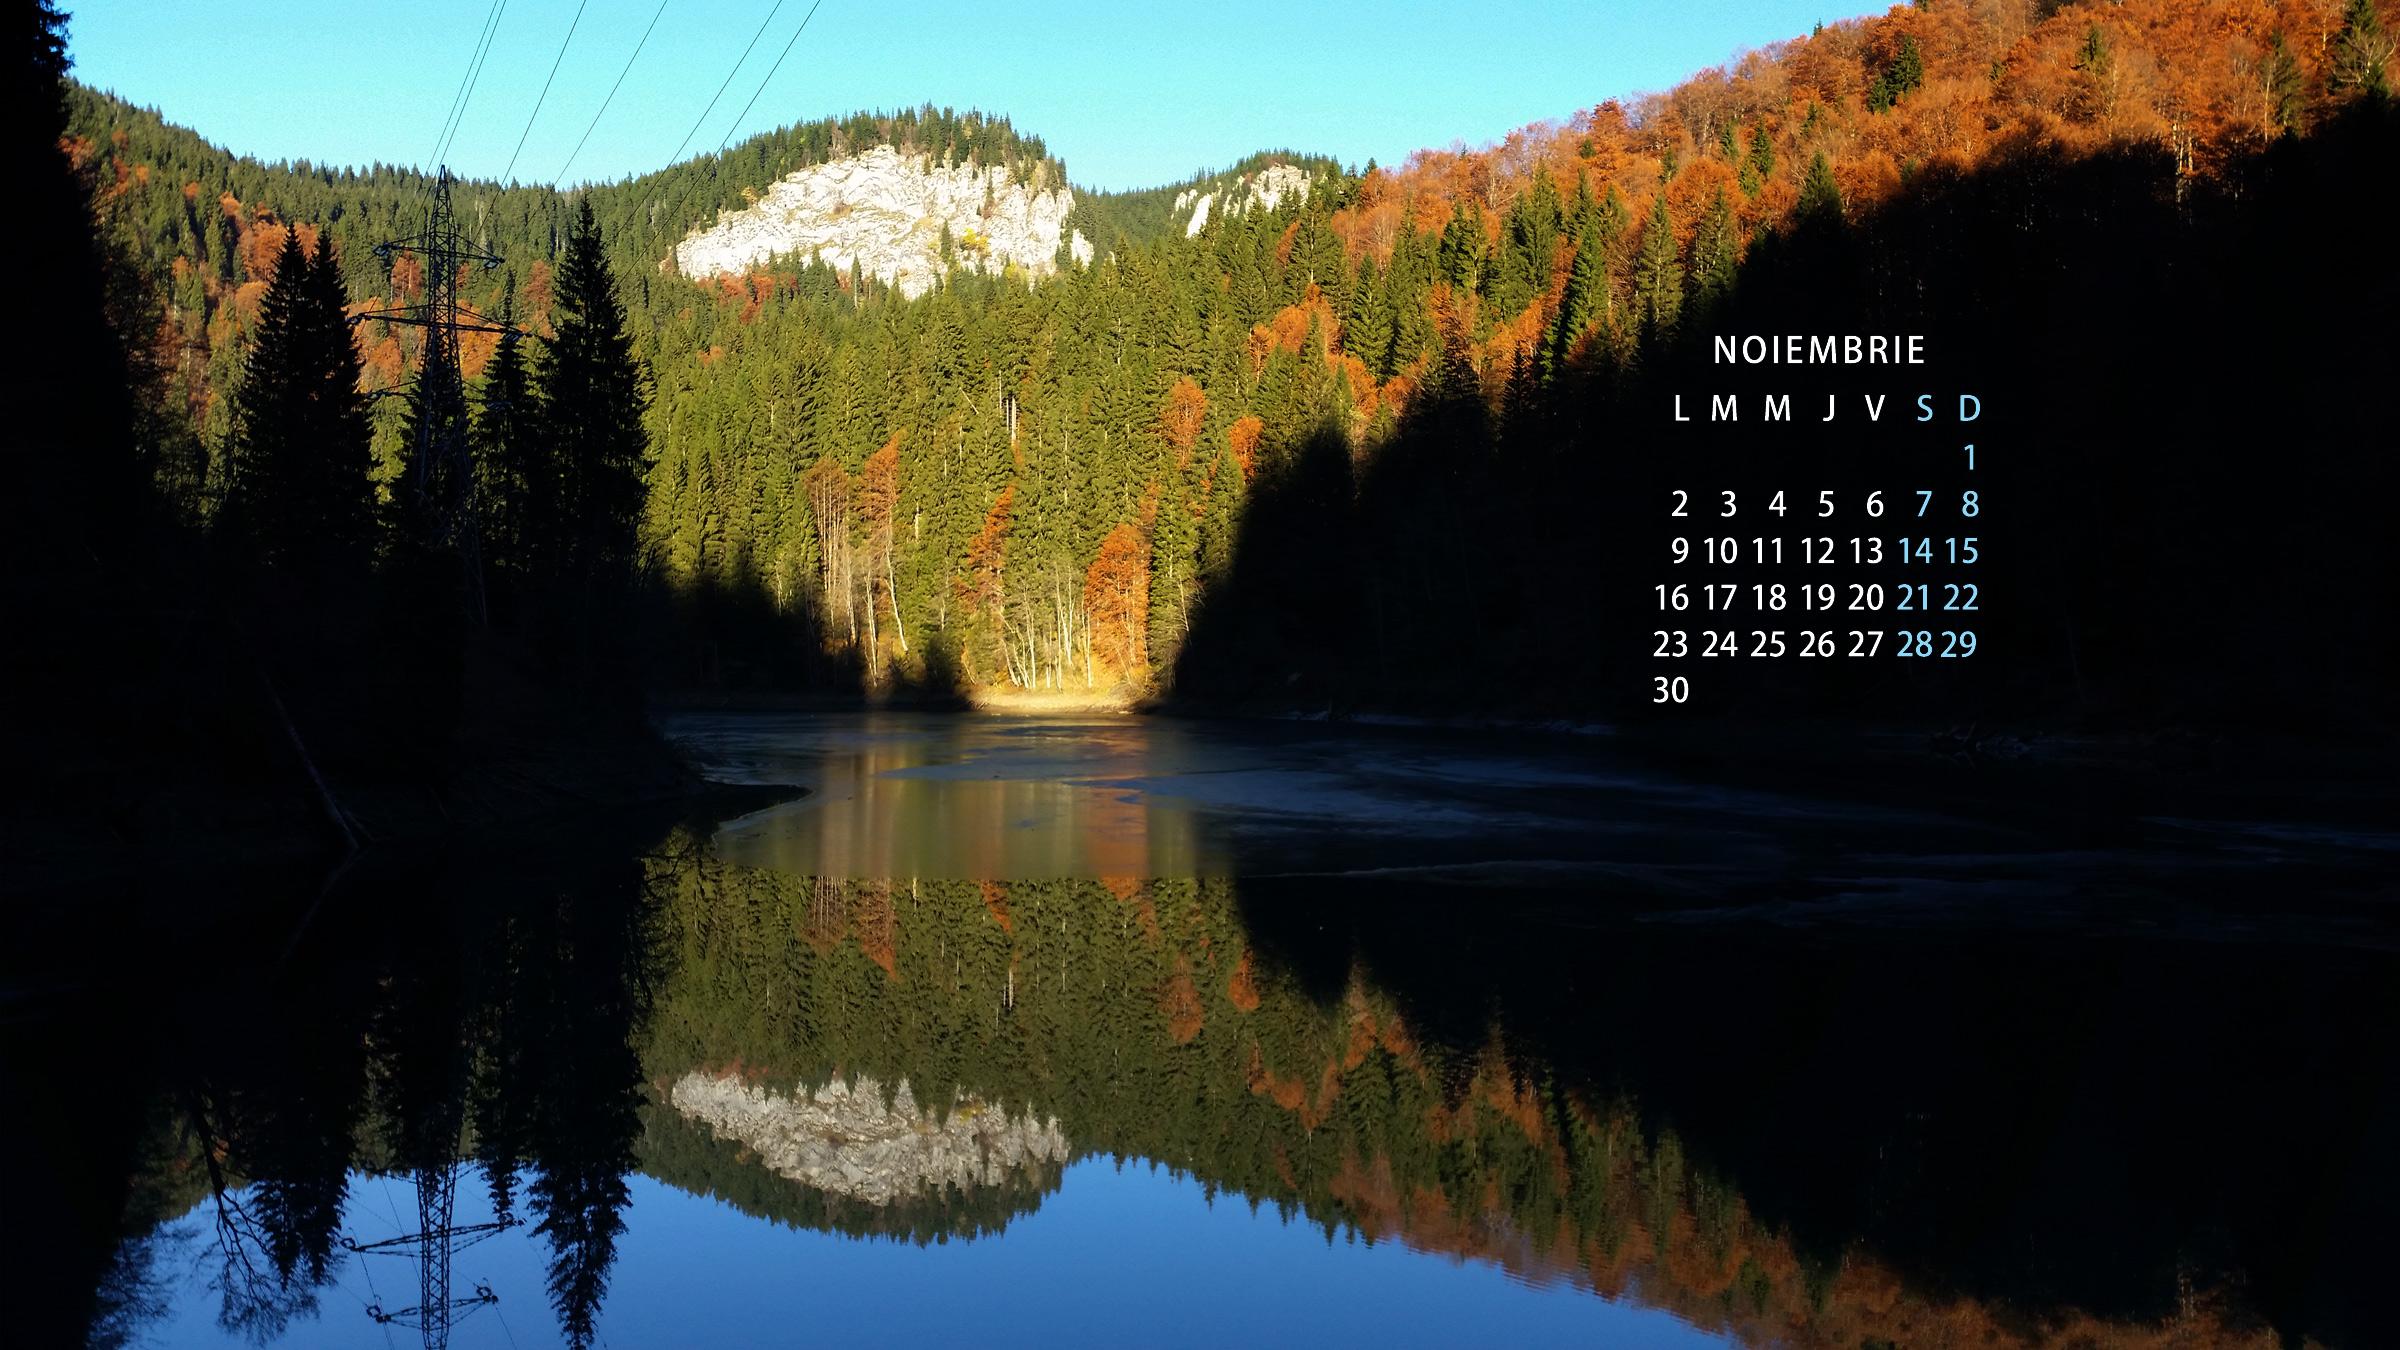 Free November 2015 calendar